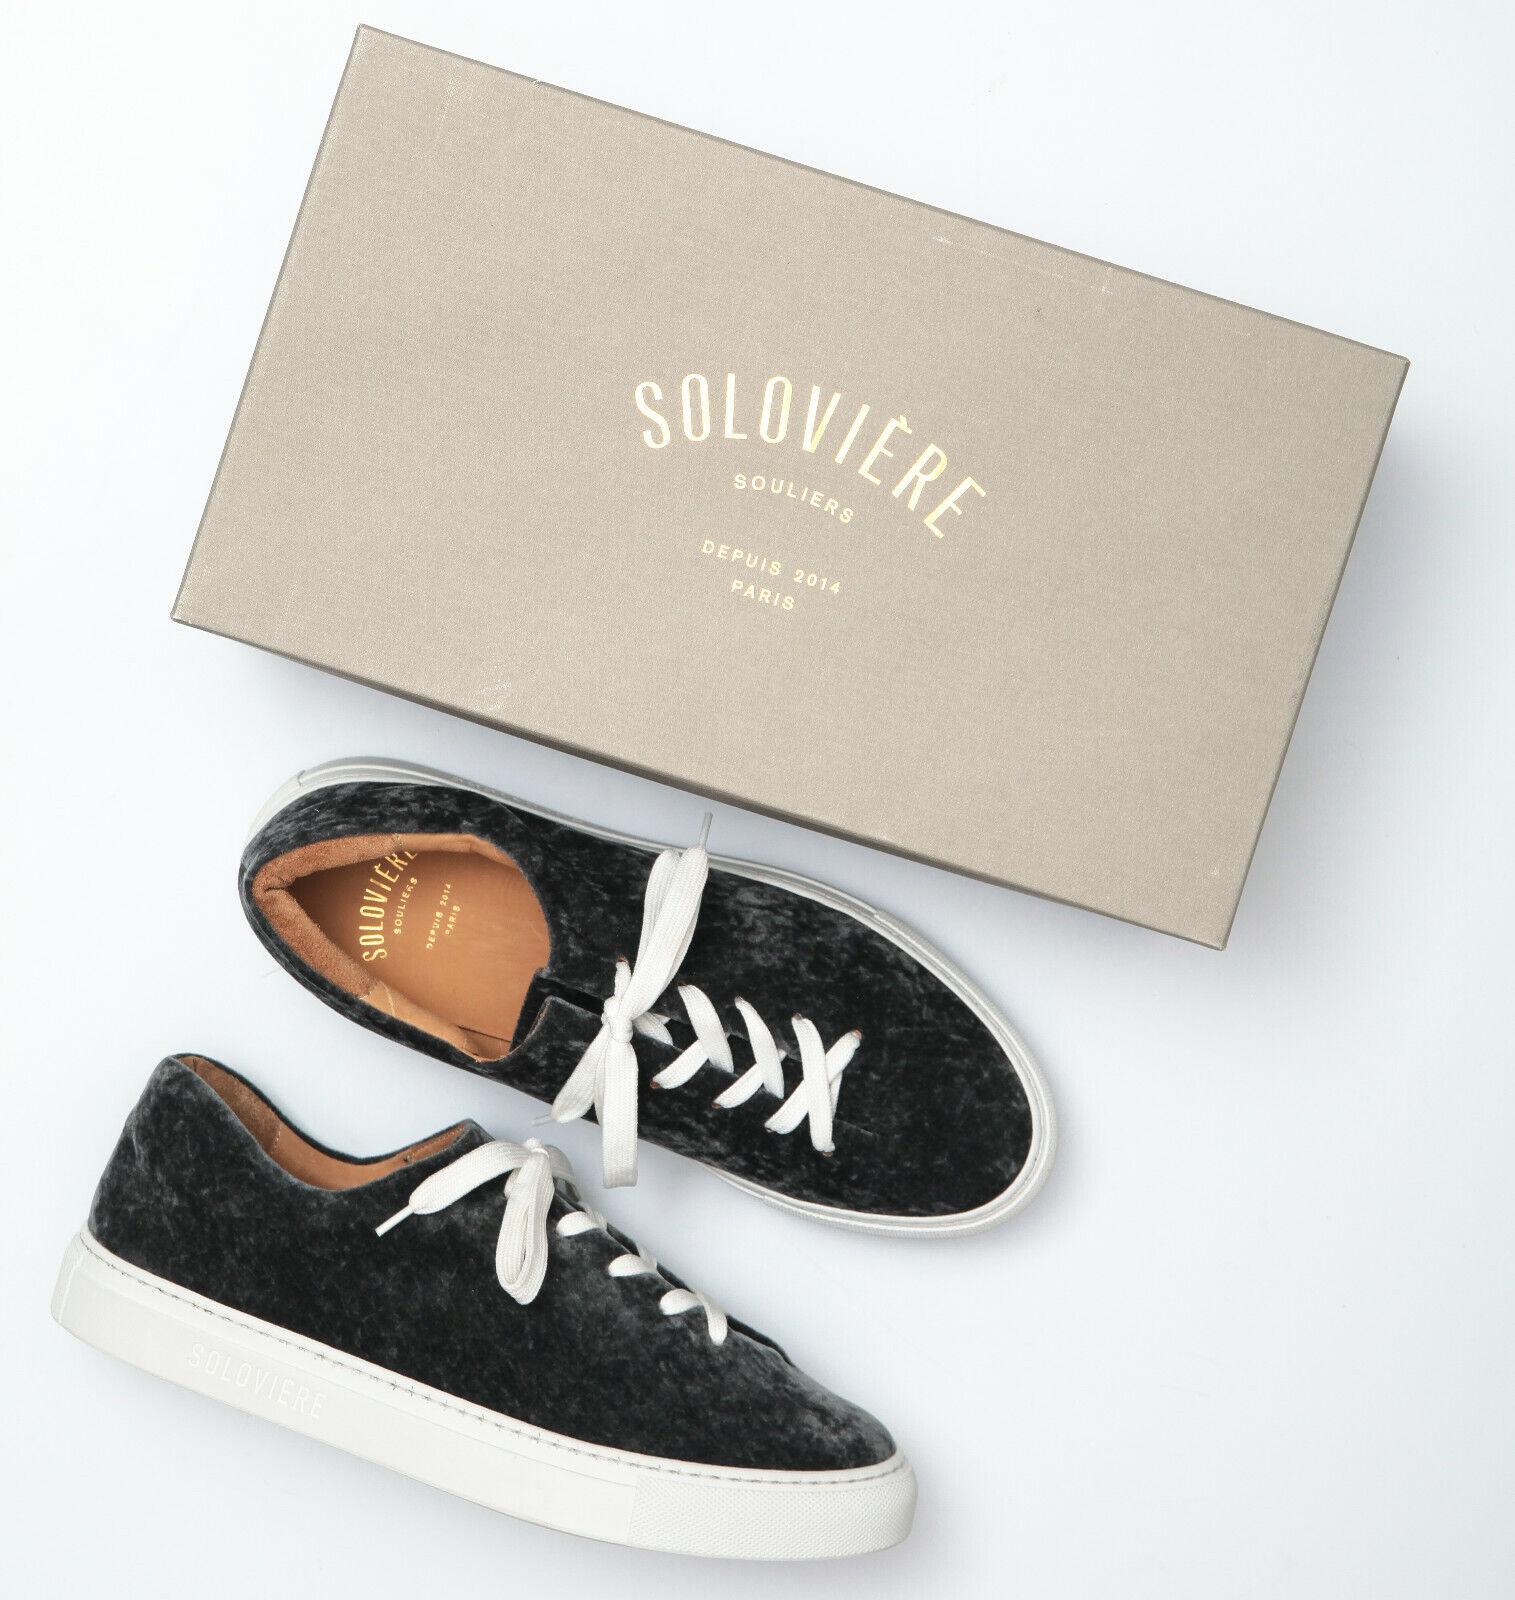 Solovier Herve  En Ville Moire grigio Velvet scarpe da ginnastica - Dimensione 40 EU  produttori fornitura diretta